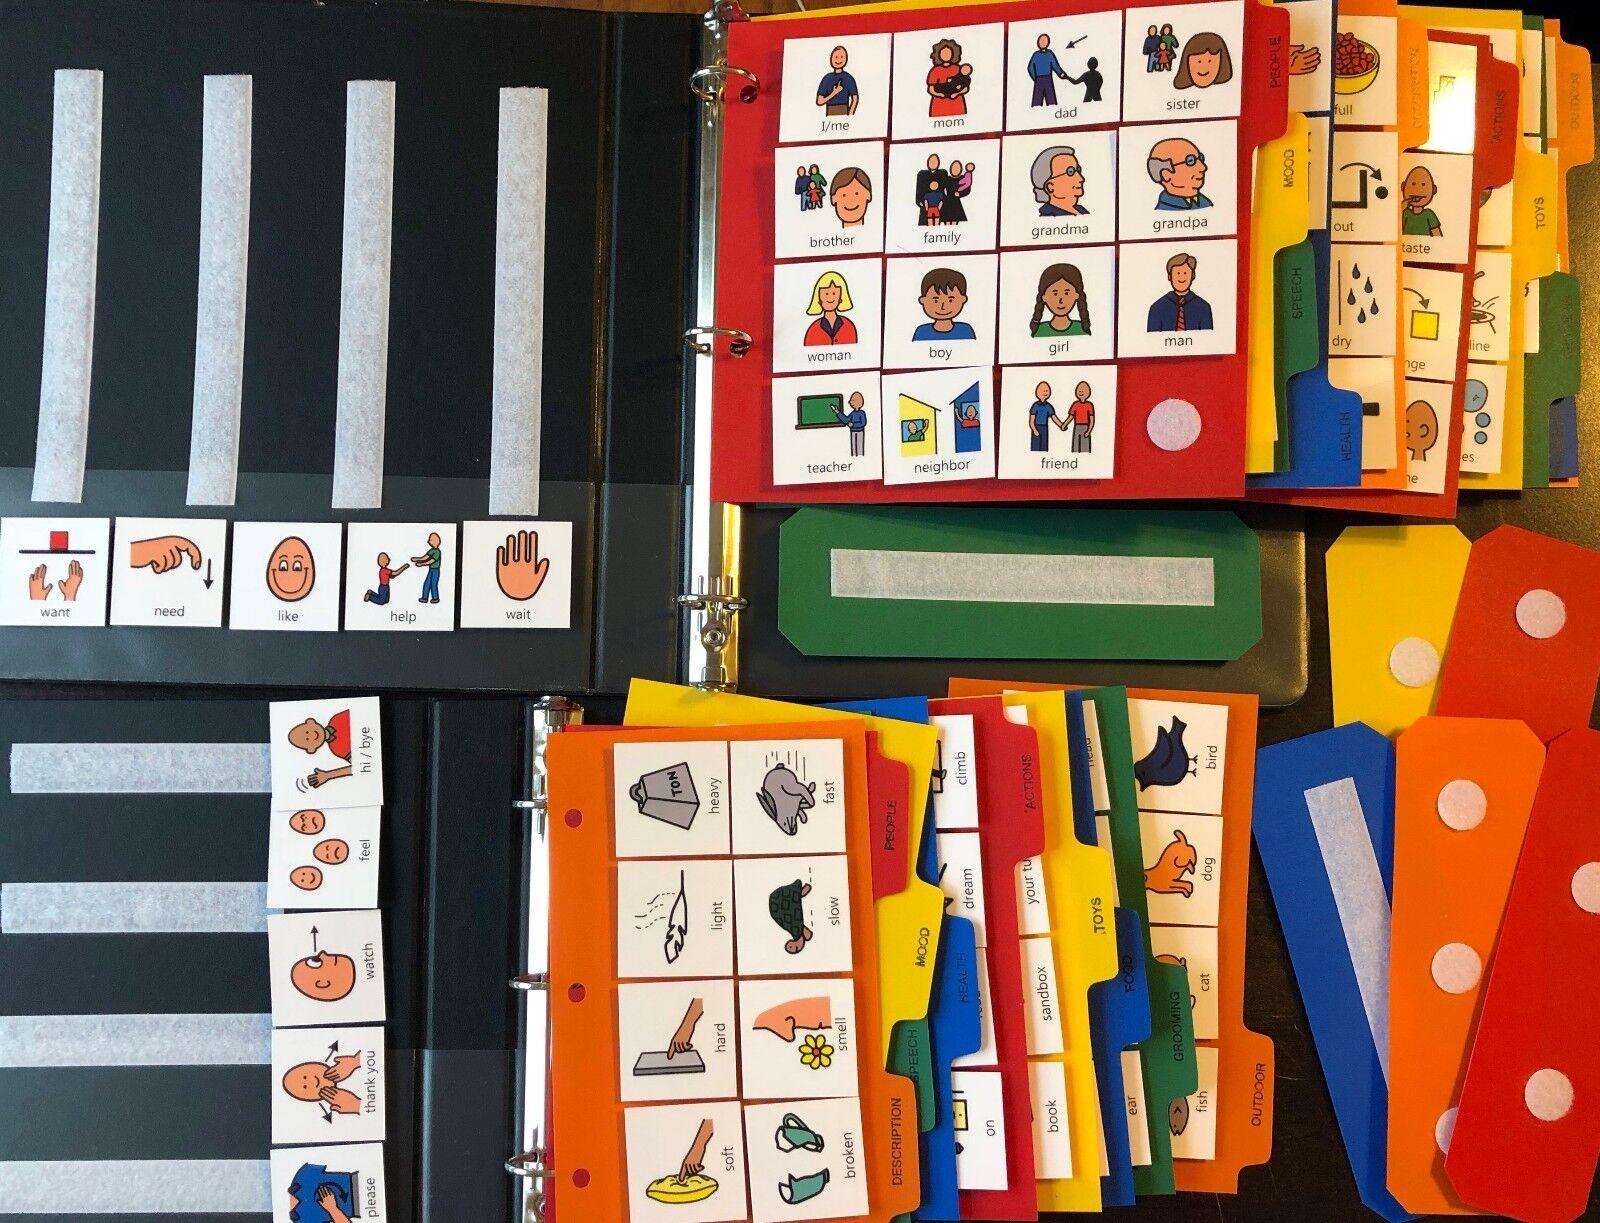 Lote 400+ Libros Bilingües tarjeta pectorales español 2 terapia del lenguaje autismo apraxia